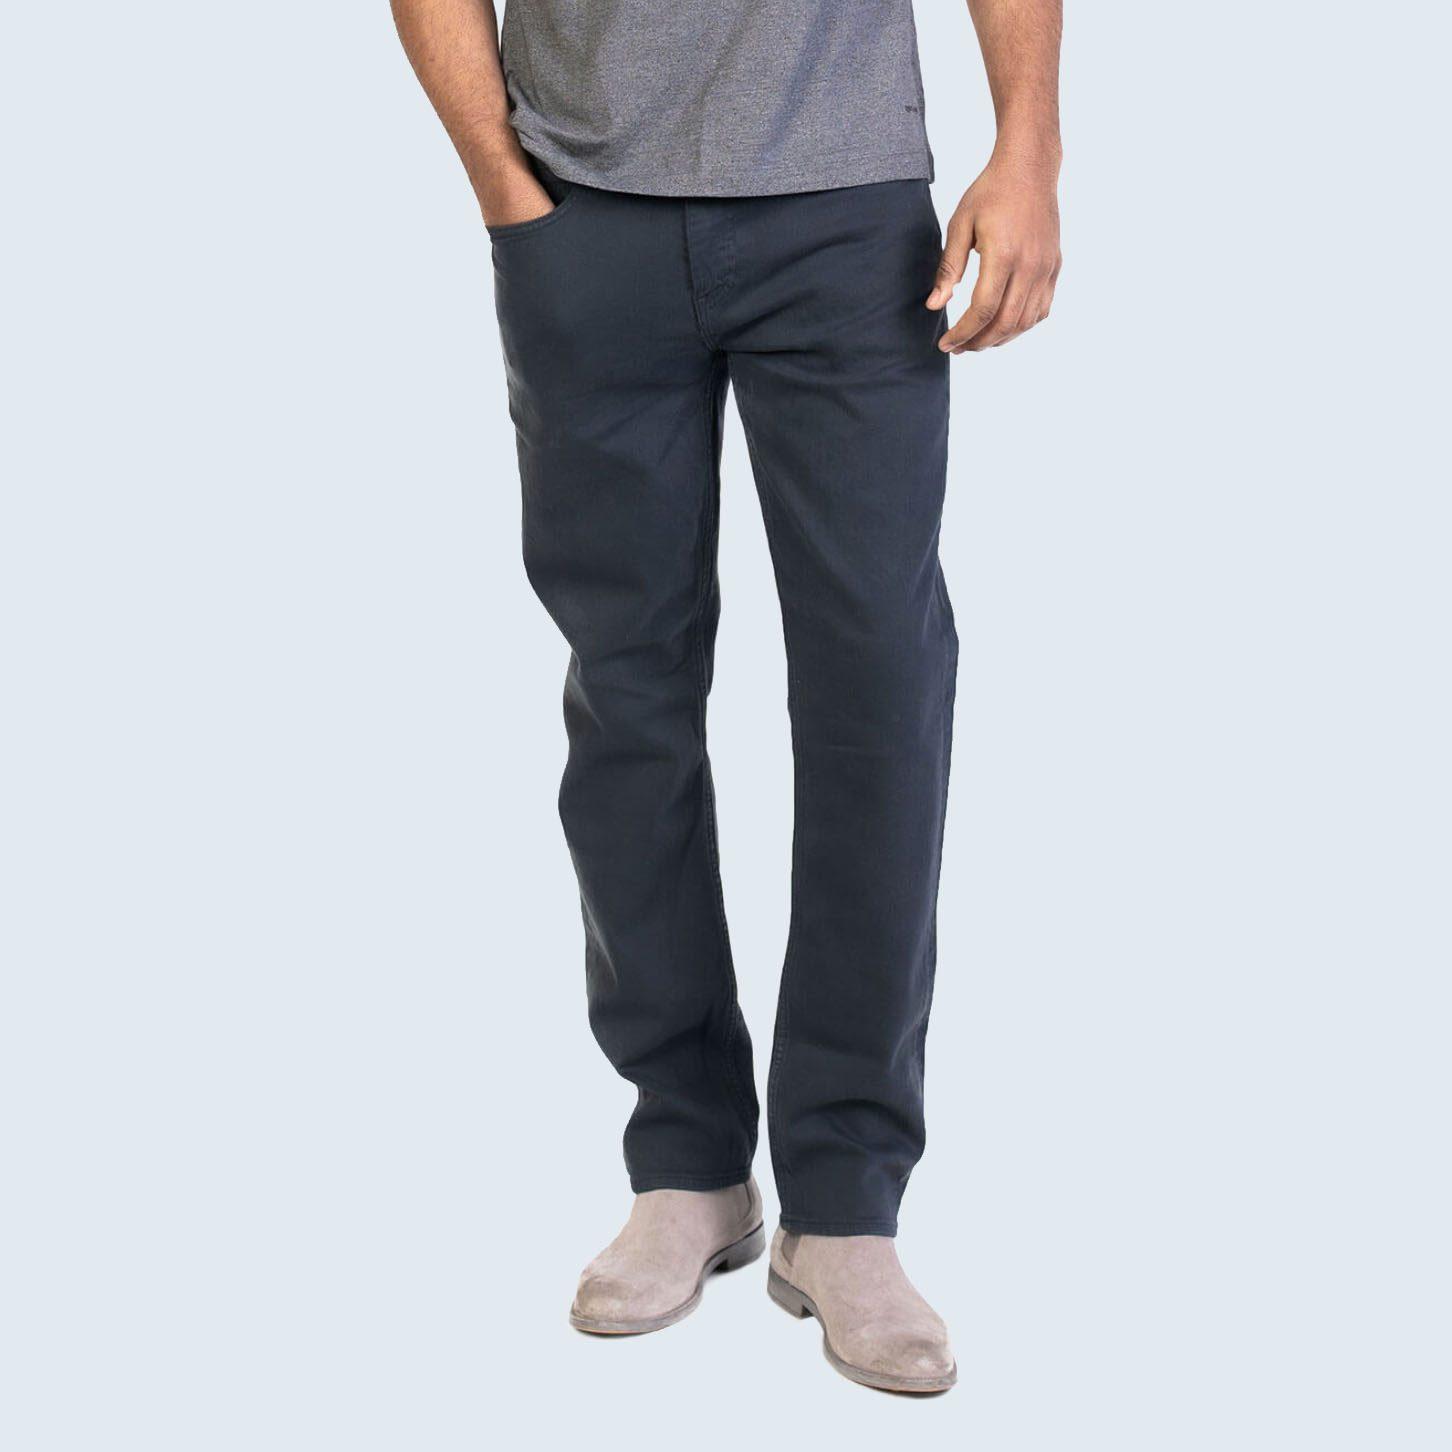 Revtown Sharp Jeans